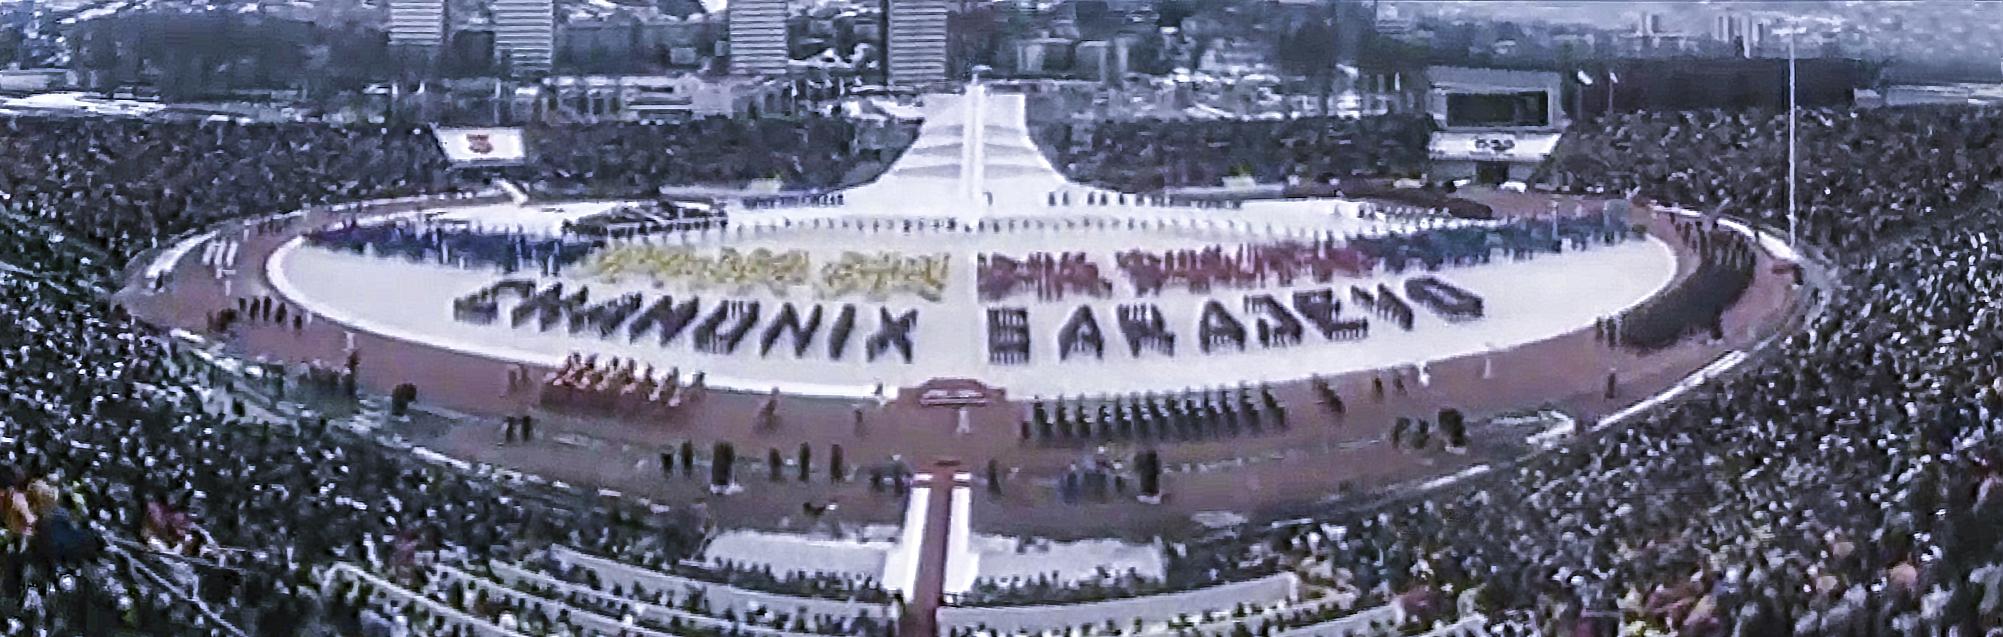 https://upload.wikimedia.org/wikipedia/commons/c/cd/1984_Winter_Olympics_opening_ceremony_at_Ko%C5%A1evo_Stadium,_Sarajevo.jpg